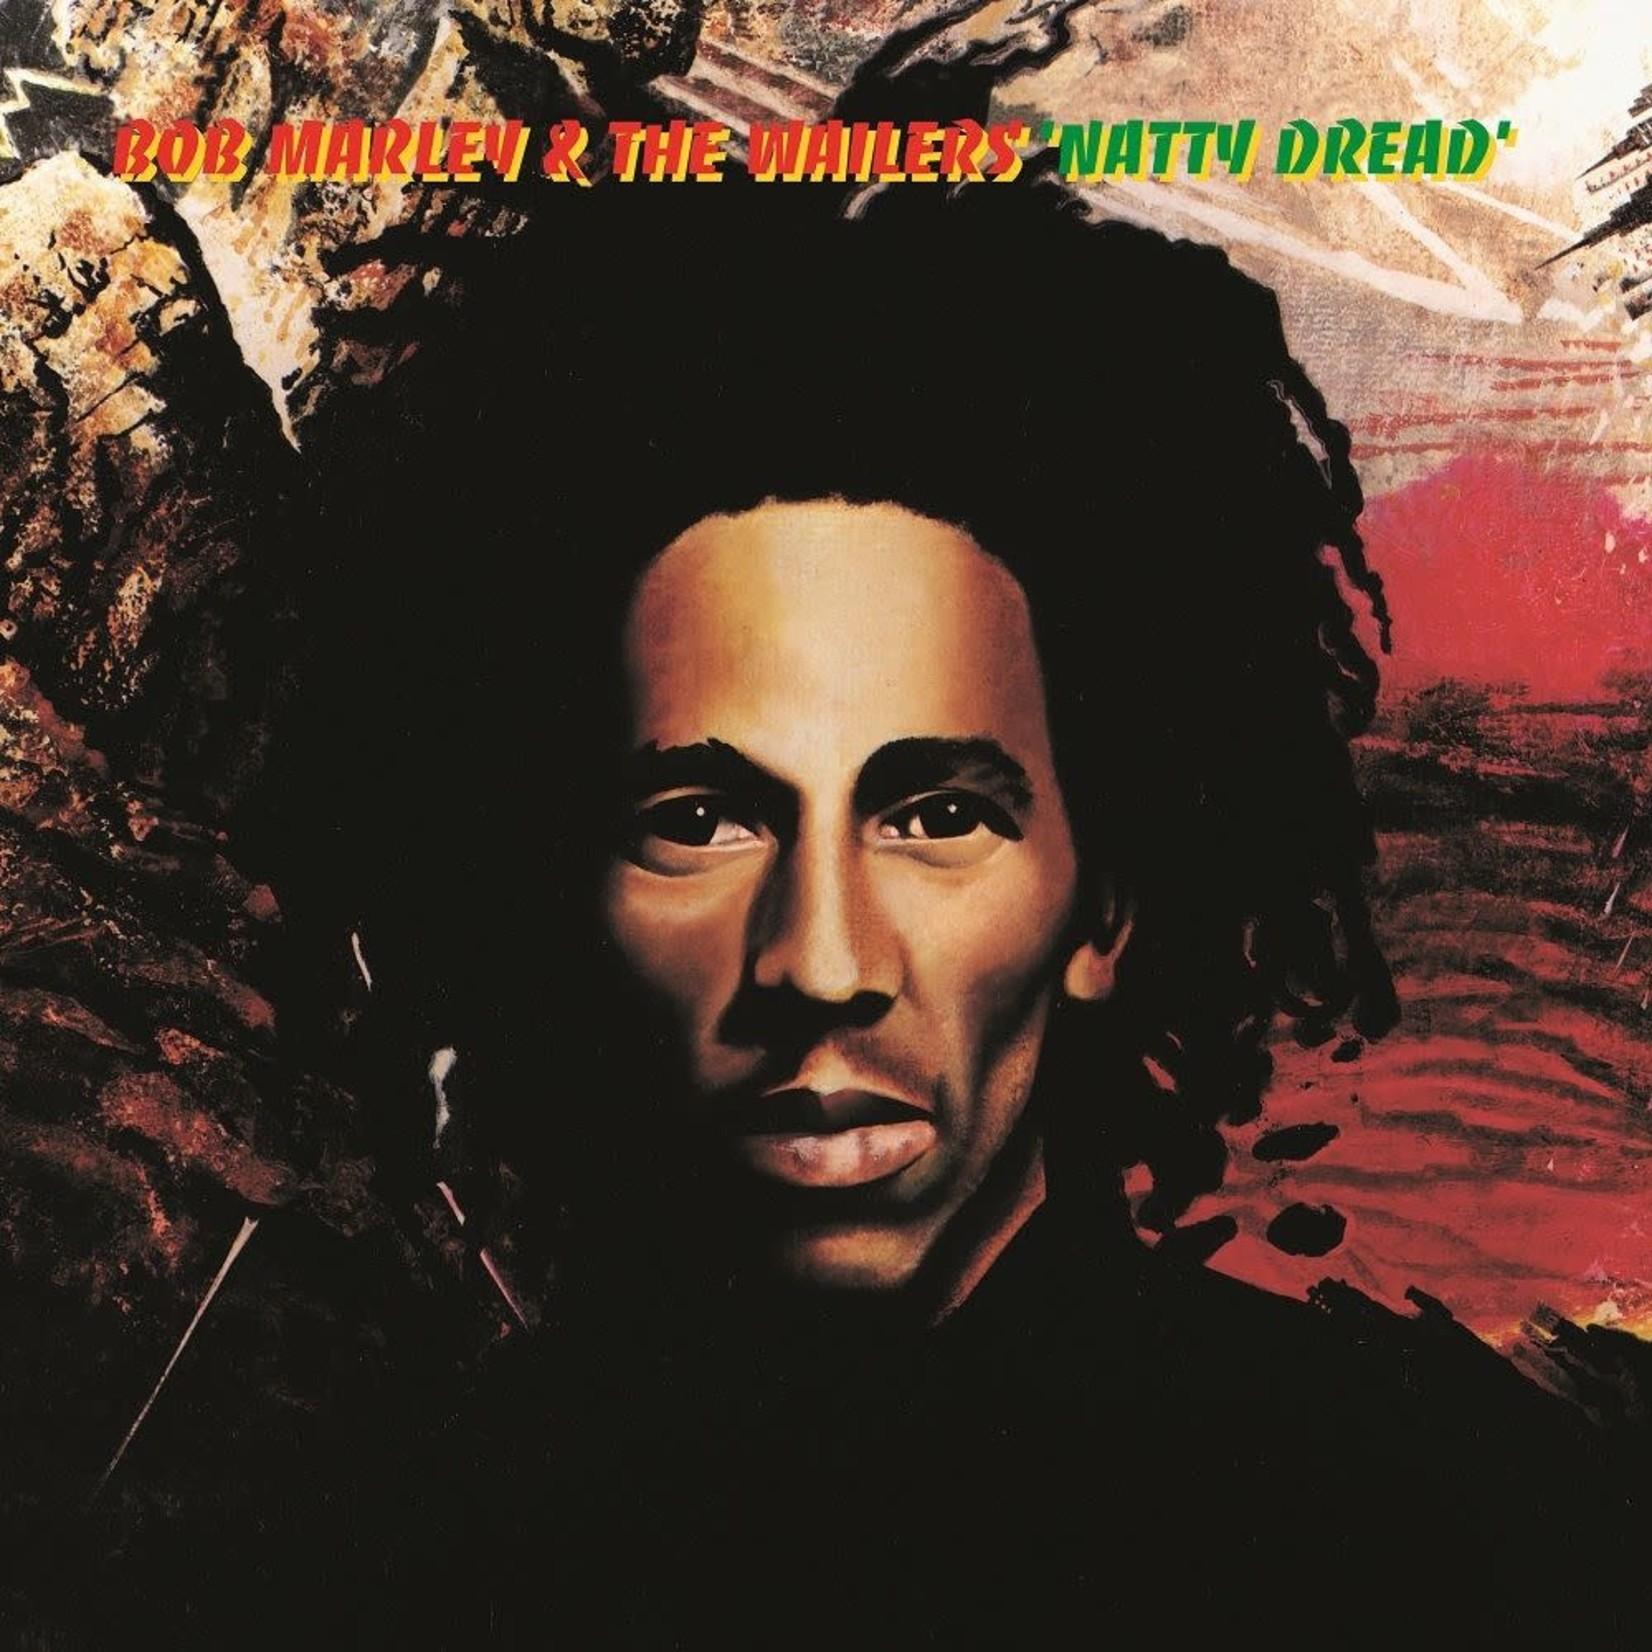 [New] Marley, Bob: Natty Dread